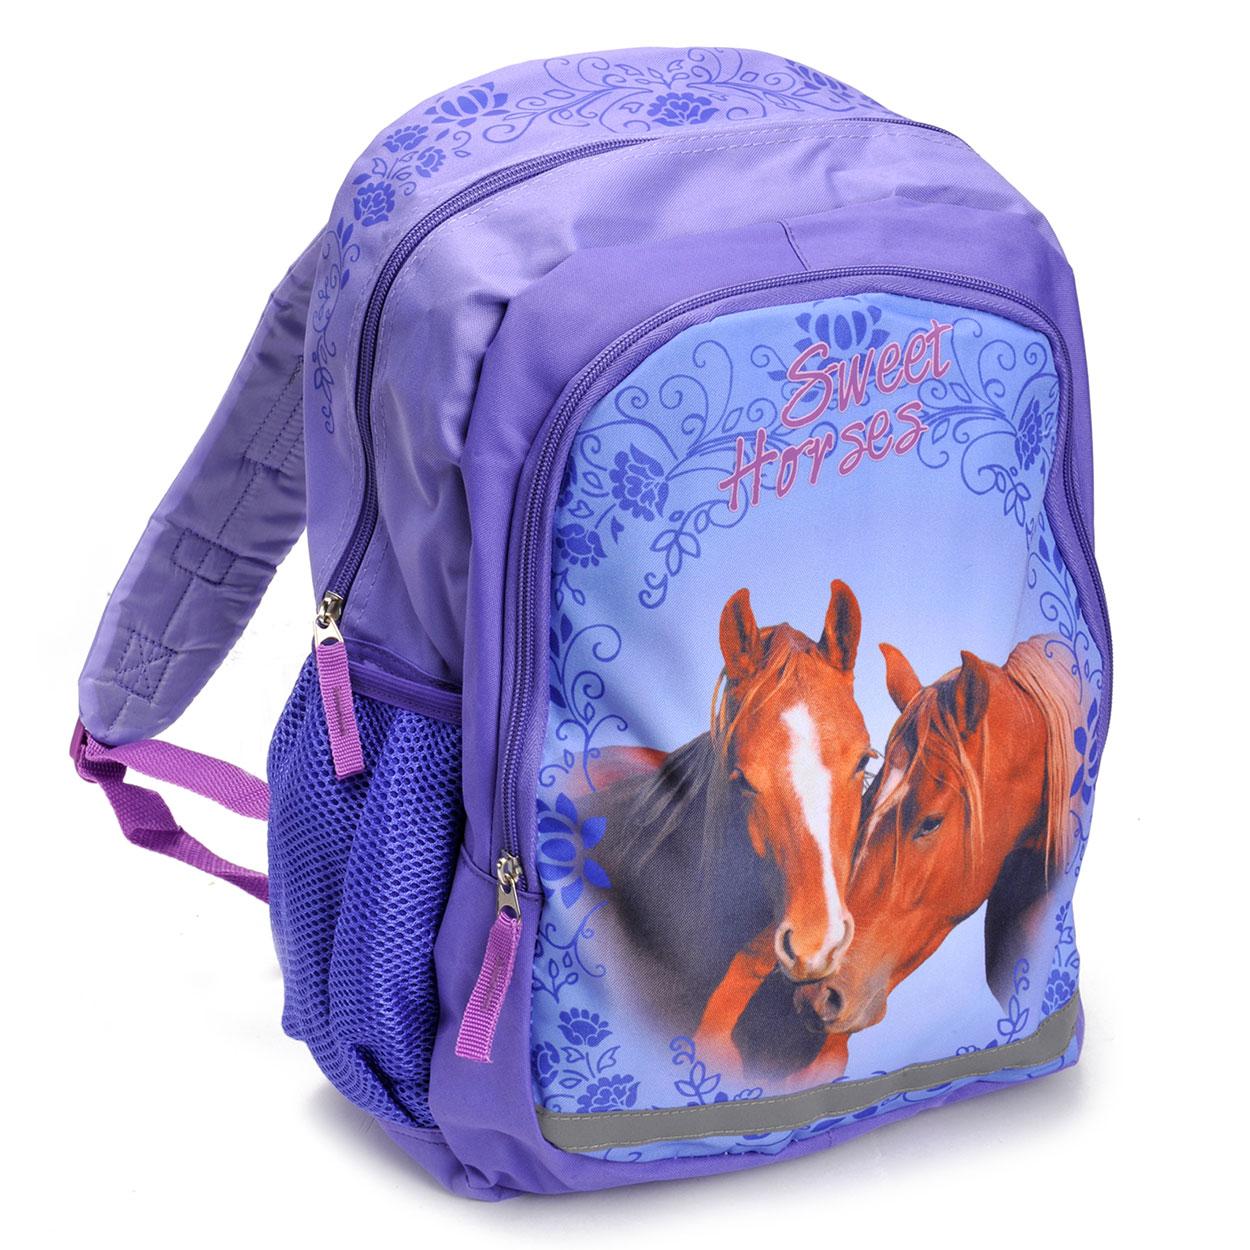 Tassen Ontwerp Wedstrijd : Sweet horses rugtas kopen lobbes